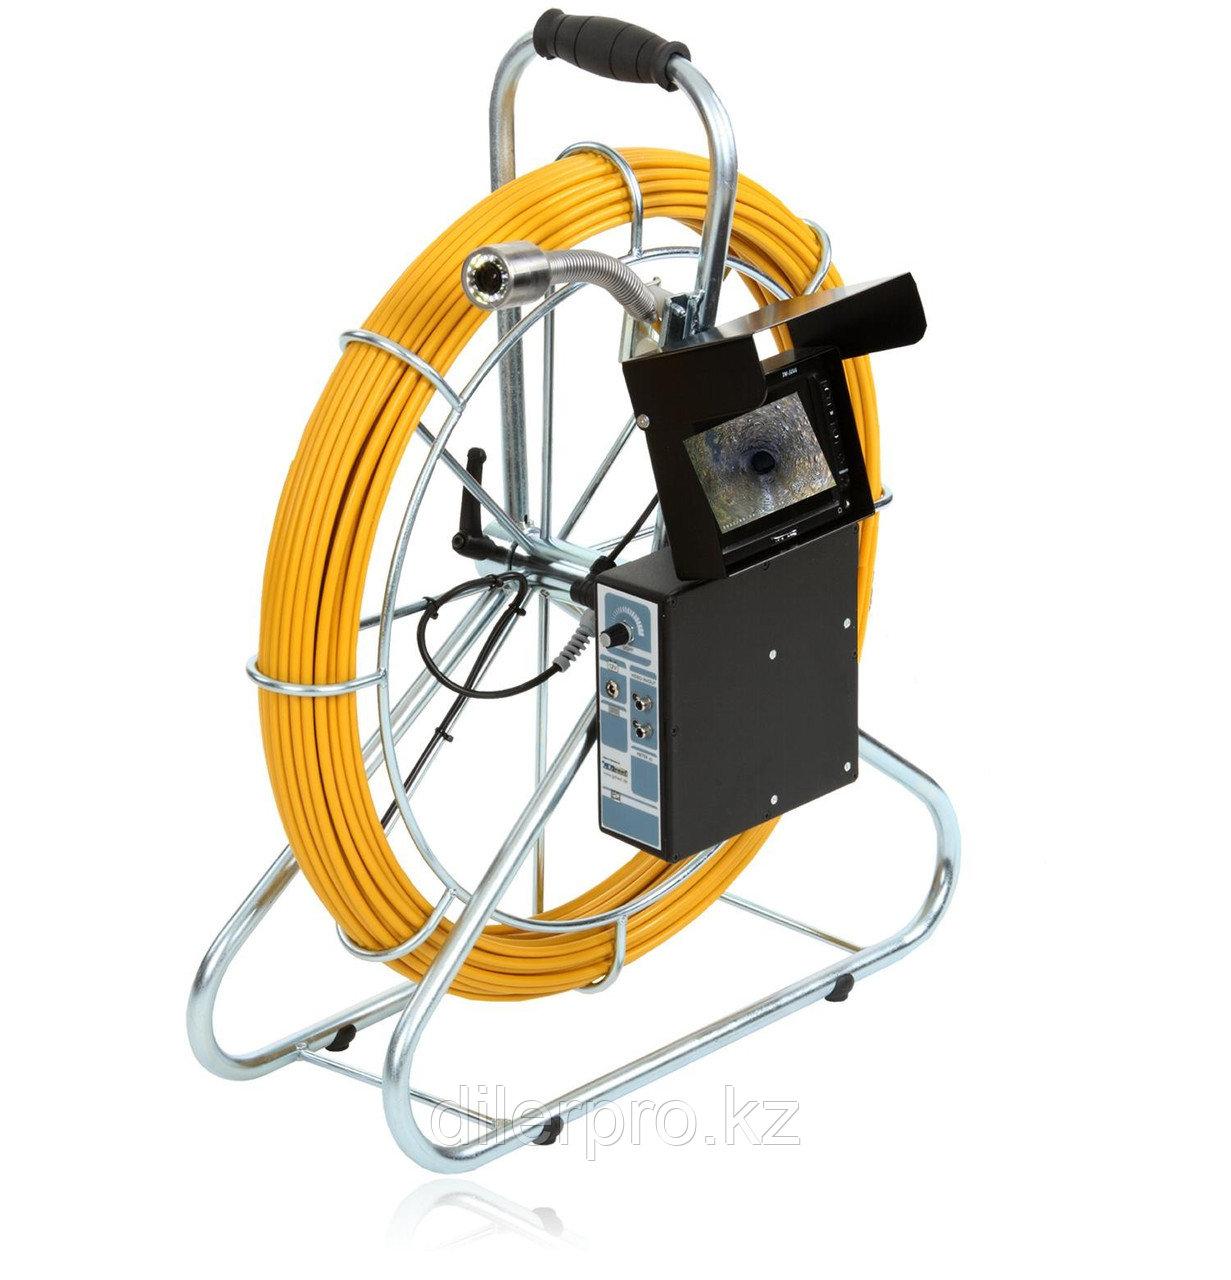 Katimex 104004MV - система видеодиагностики трубопровода серии KIS-125 с цифровым видео рекодером с картой памяти 2GB